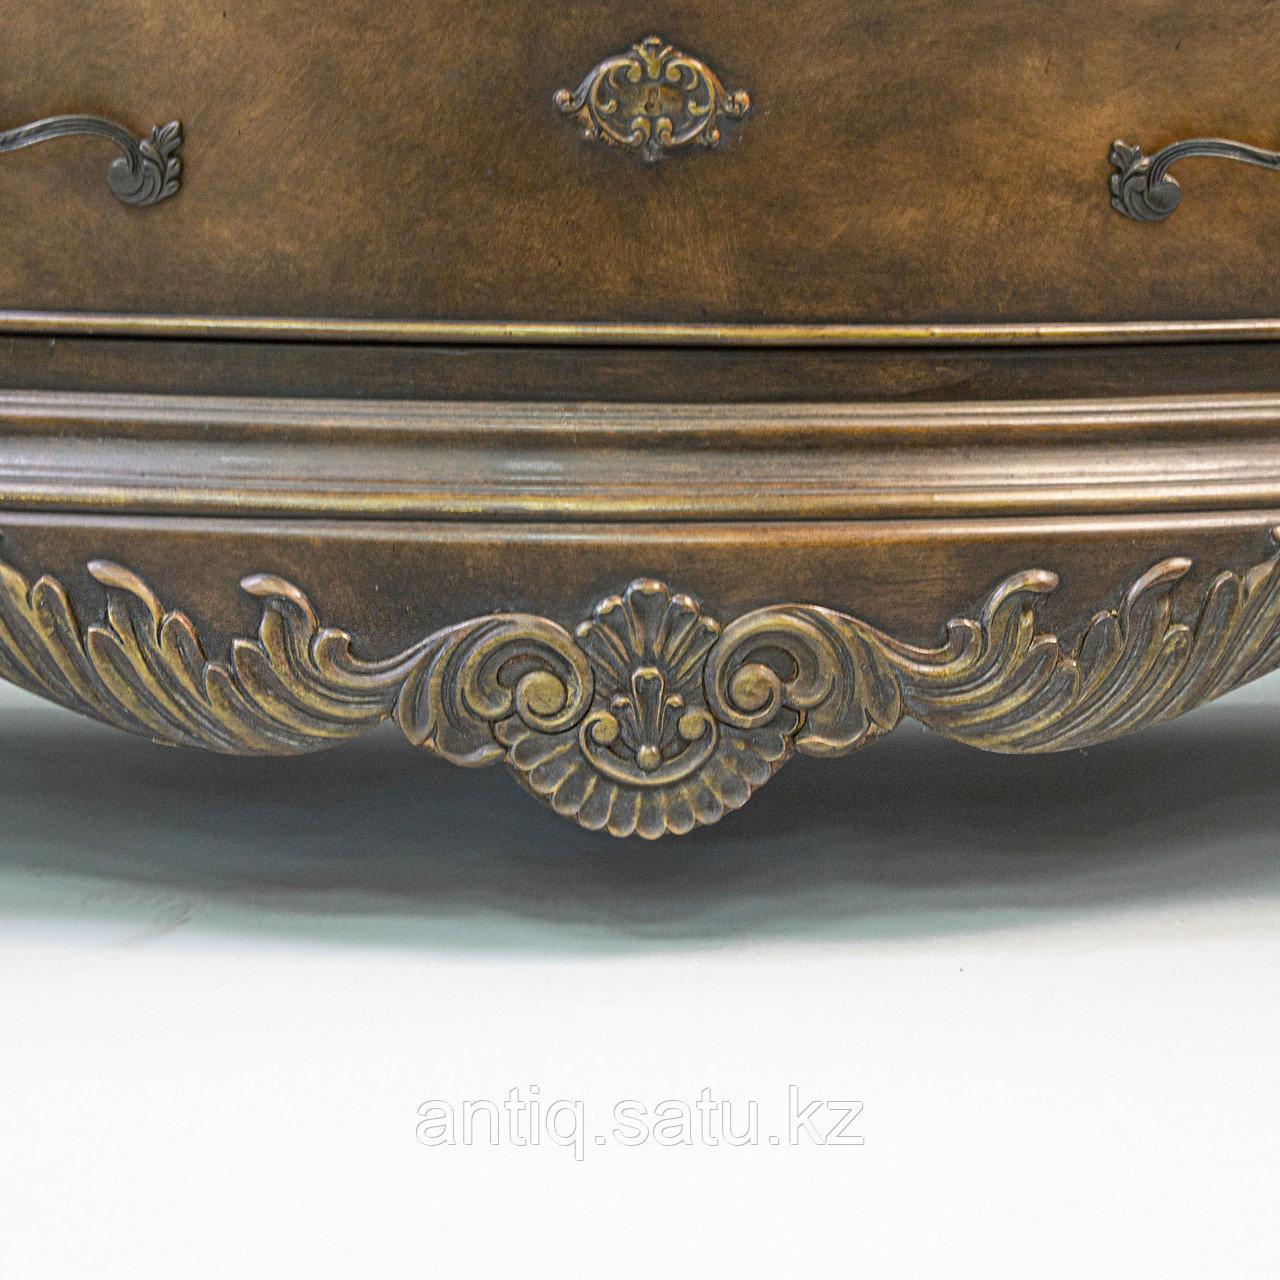 Комод в стиле Людовика XV Привезен из Голландии XX век. - фото 8